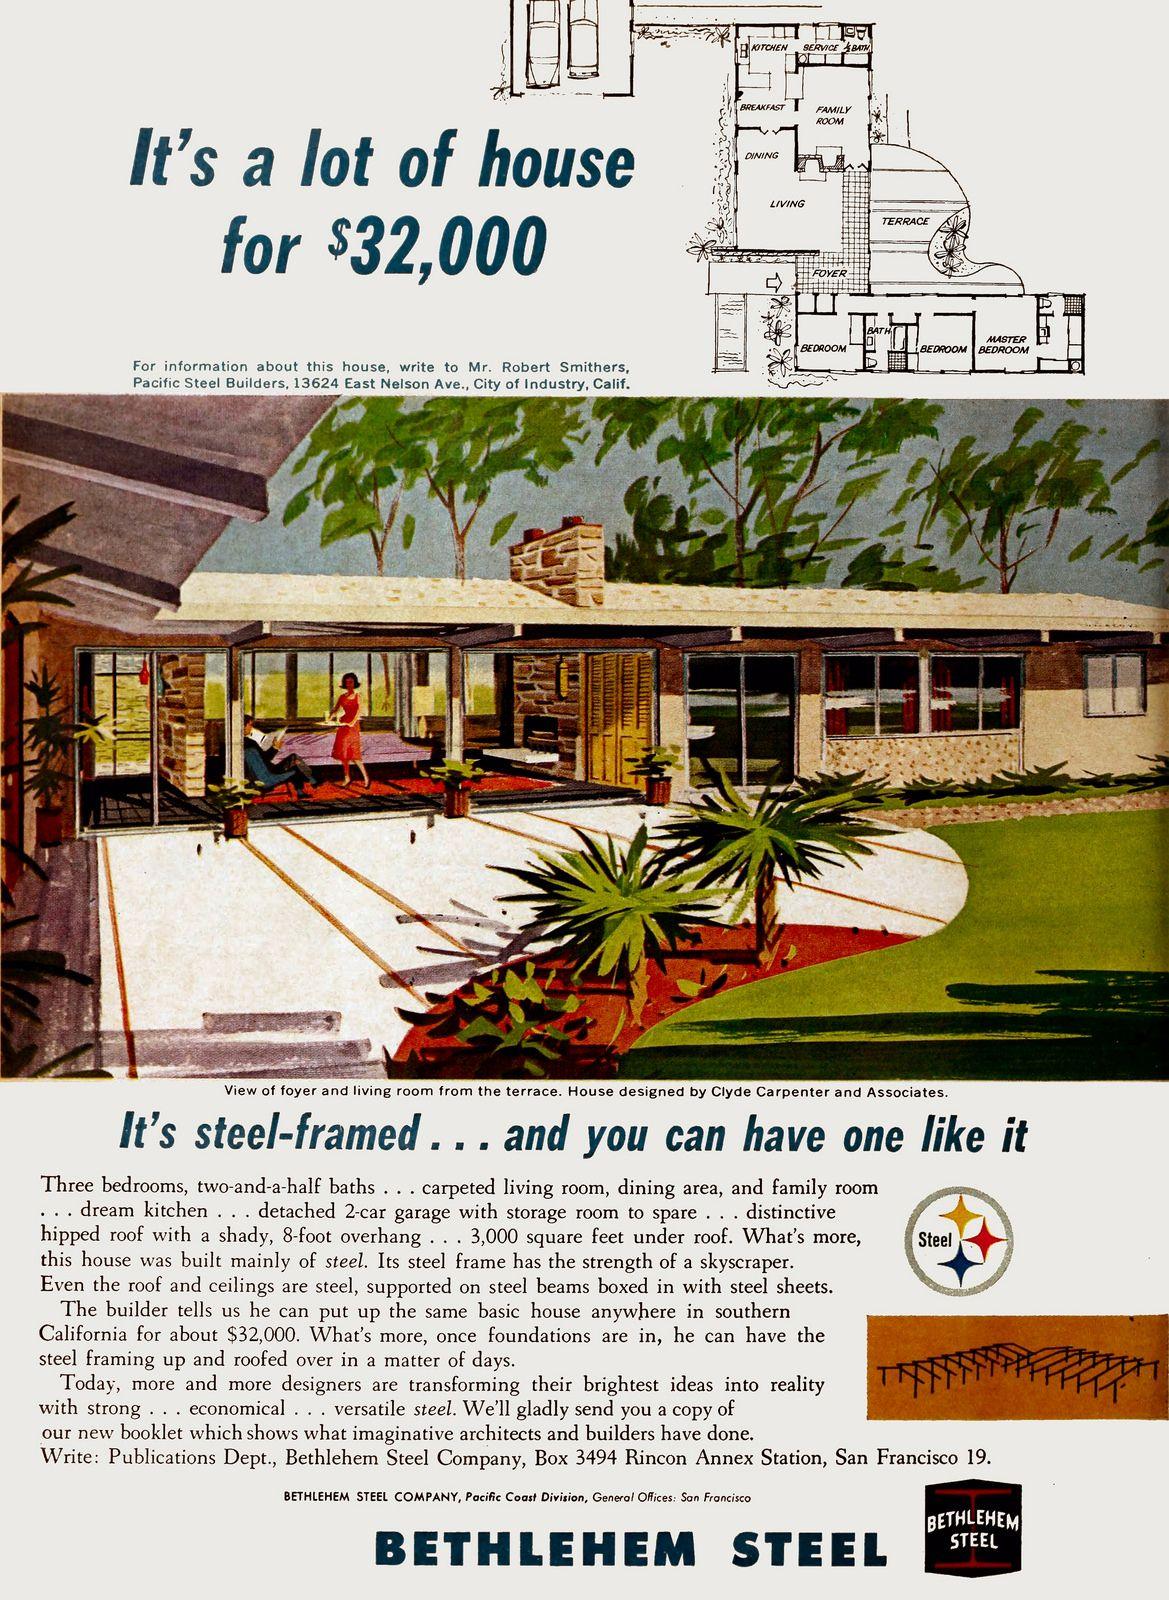 Bethlehem Steel Ad Architect Clyde Carpenter 1962